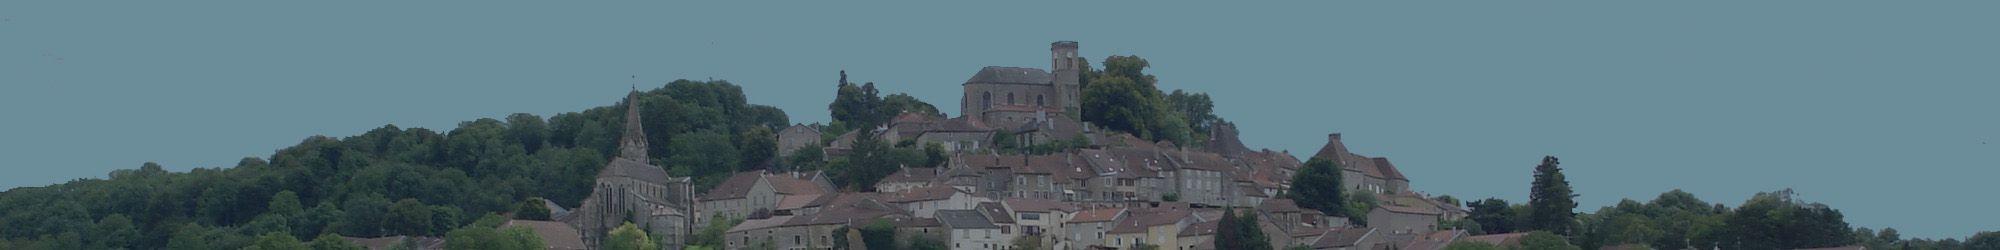 Paysage de Haute-Marne